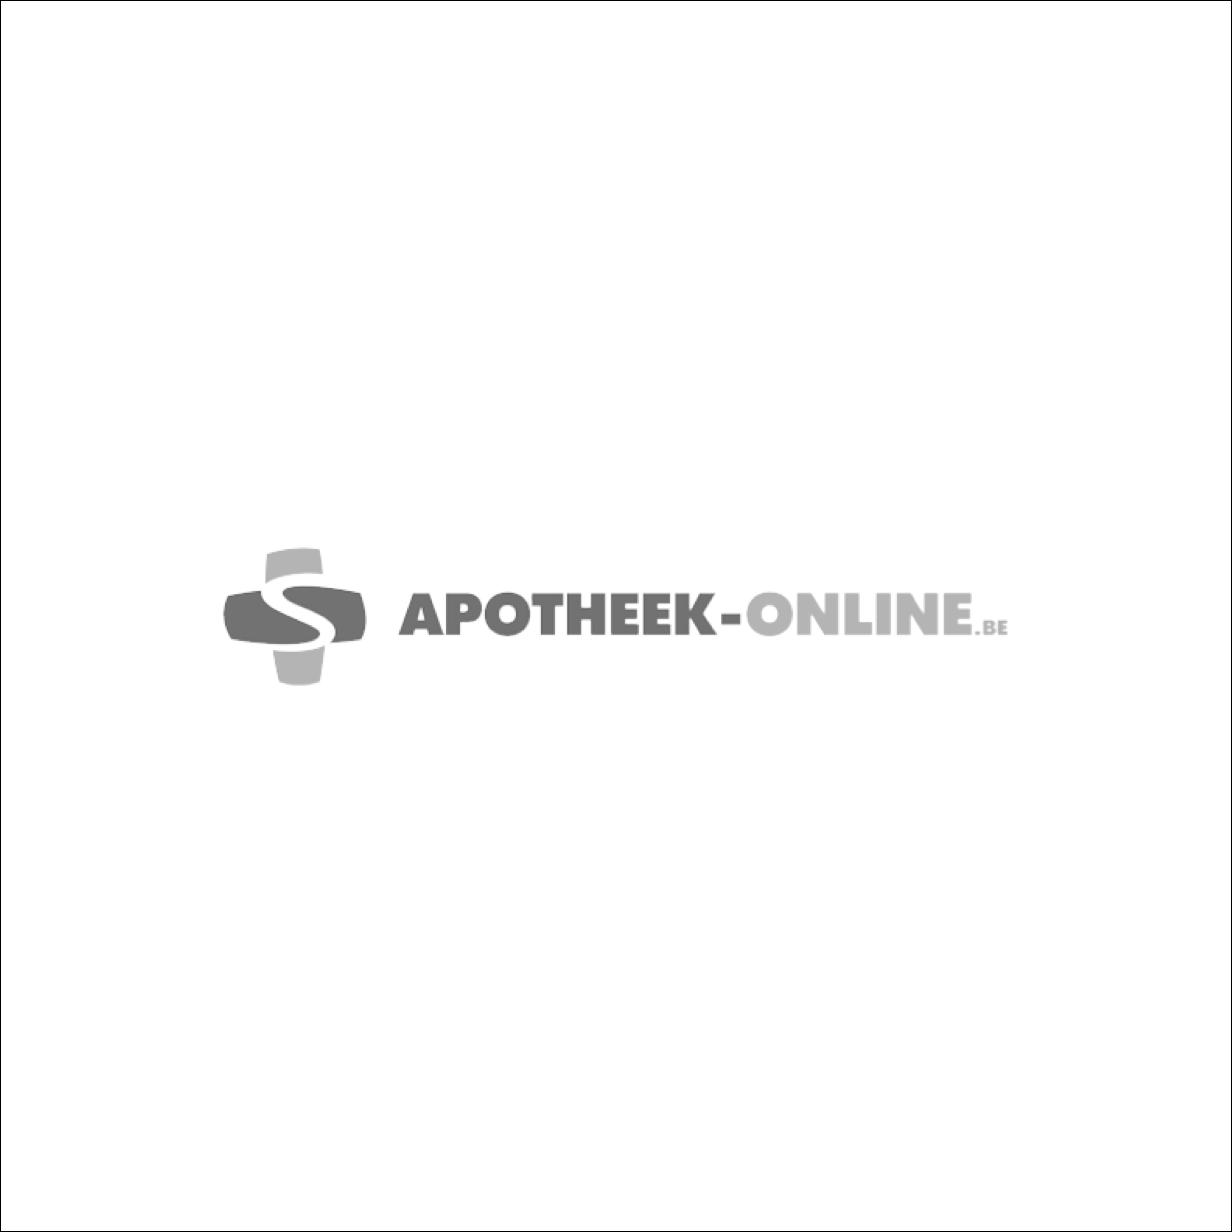 Eubos Urea 10% Bodylotion Peau Seche Refill 400ml